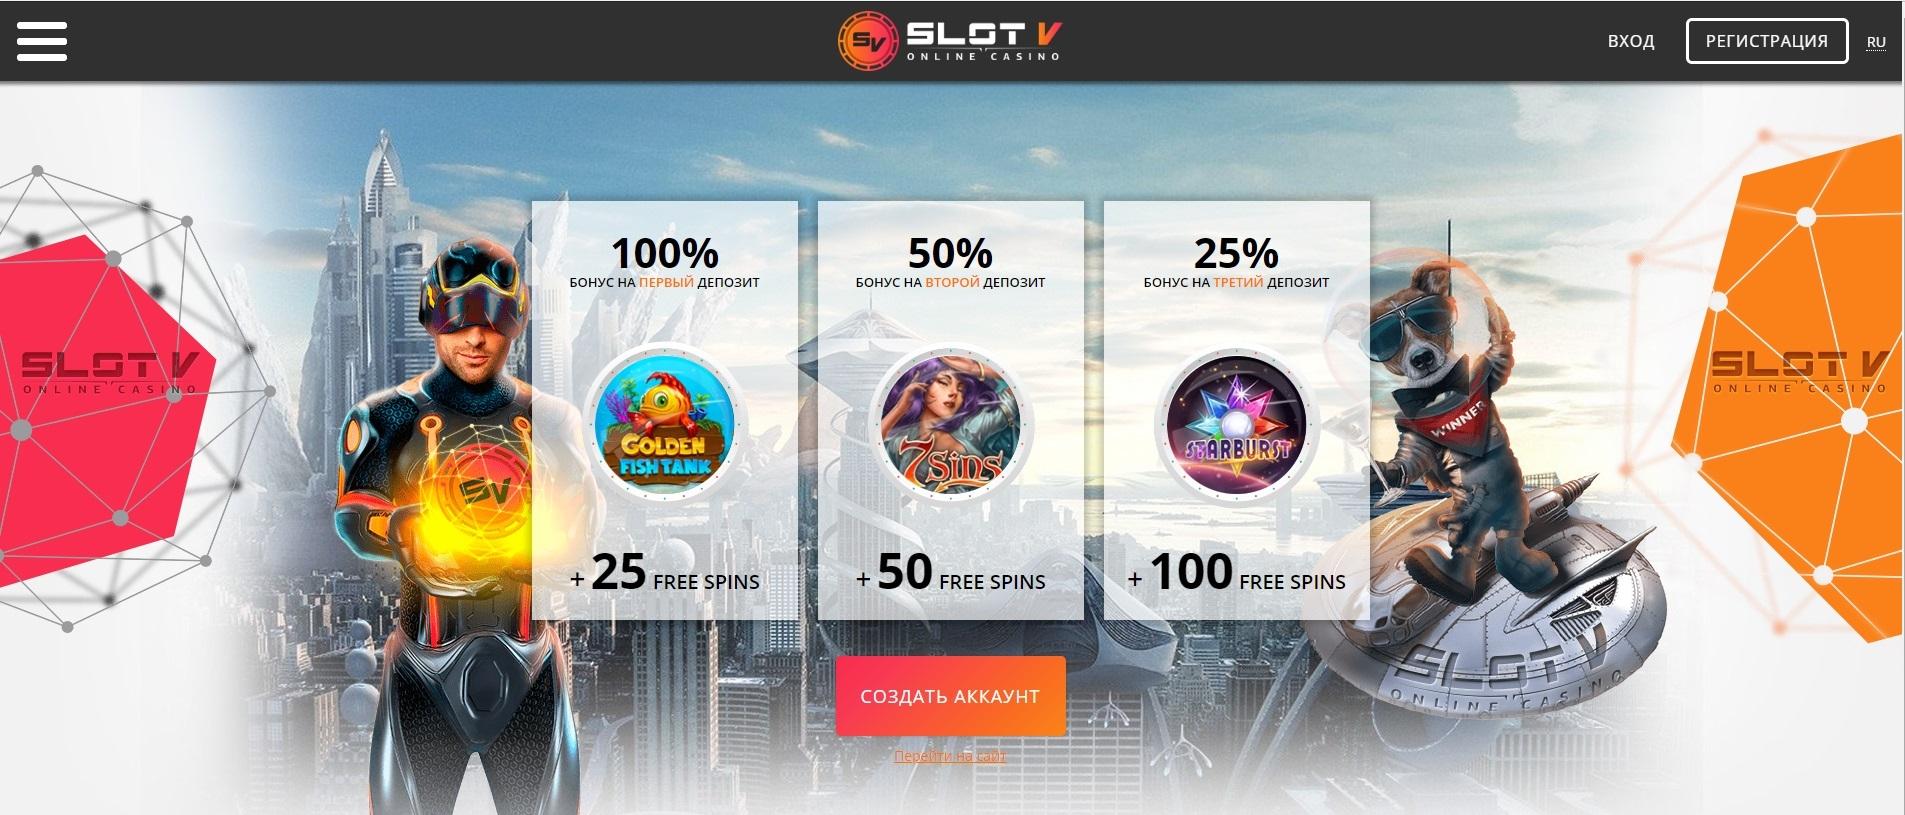 slot v casino официальный сайт